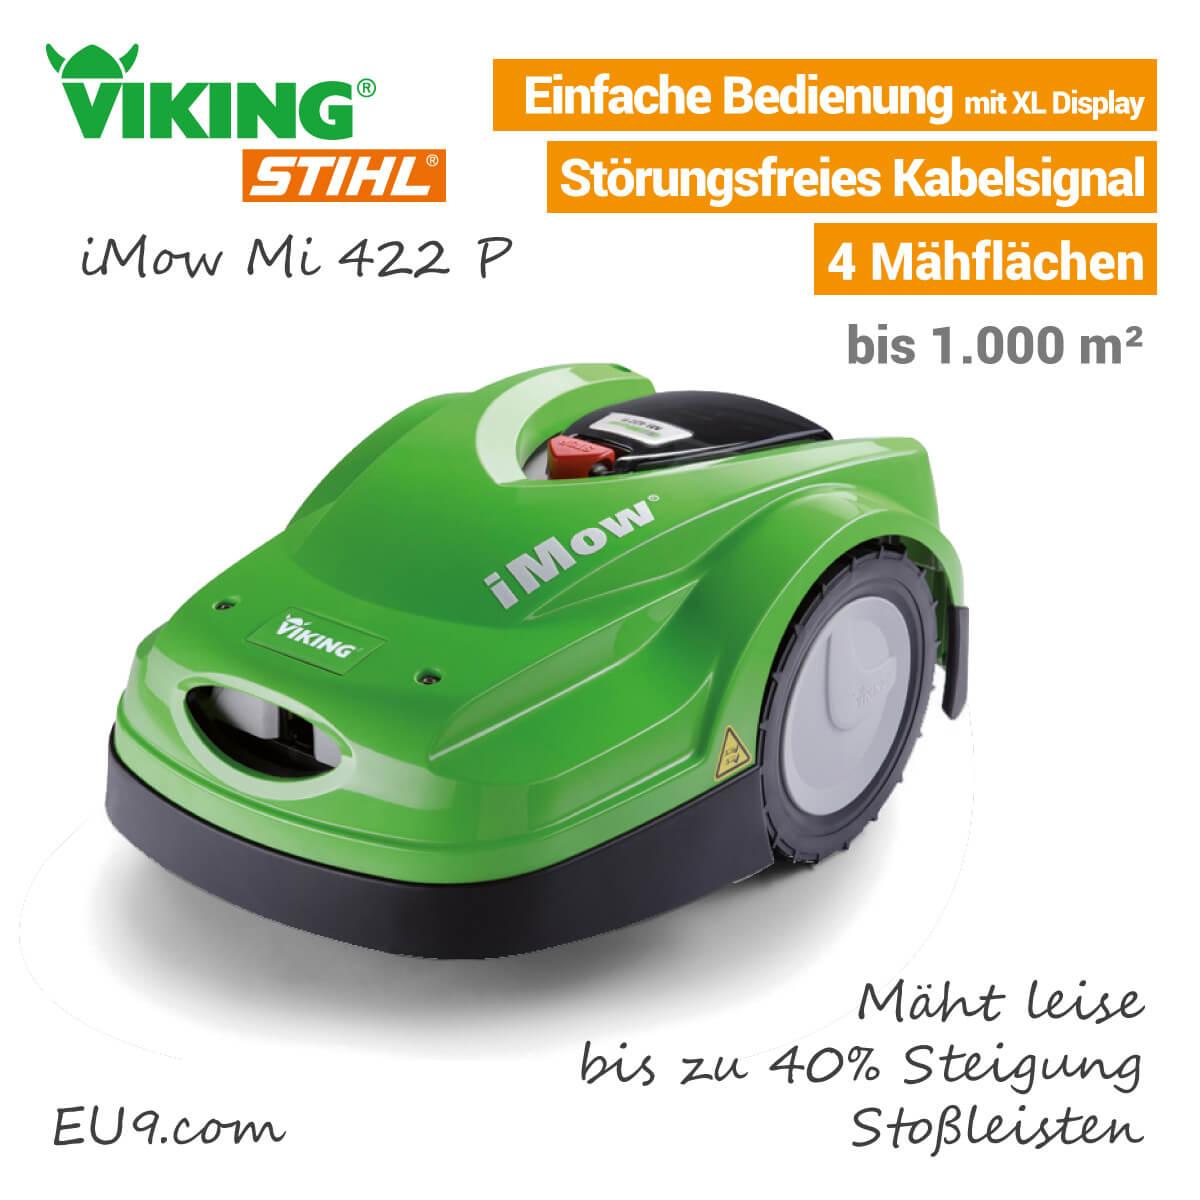 neu 2018 viking mi 422 p imow m hroboter bei eu9. Black Bedroom Furniture Sets. Home Design Ideas